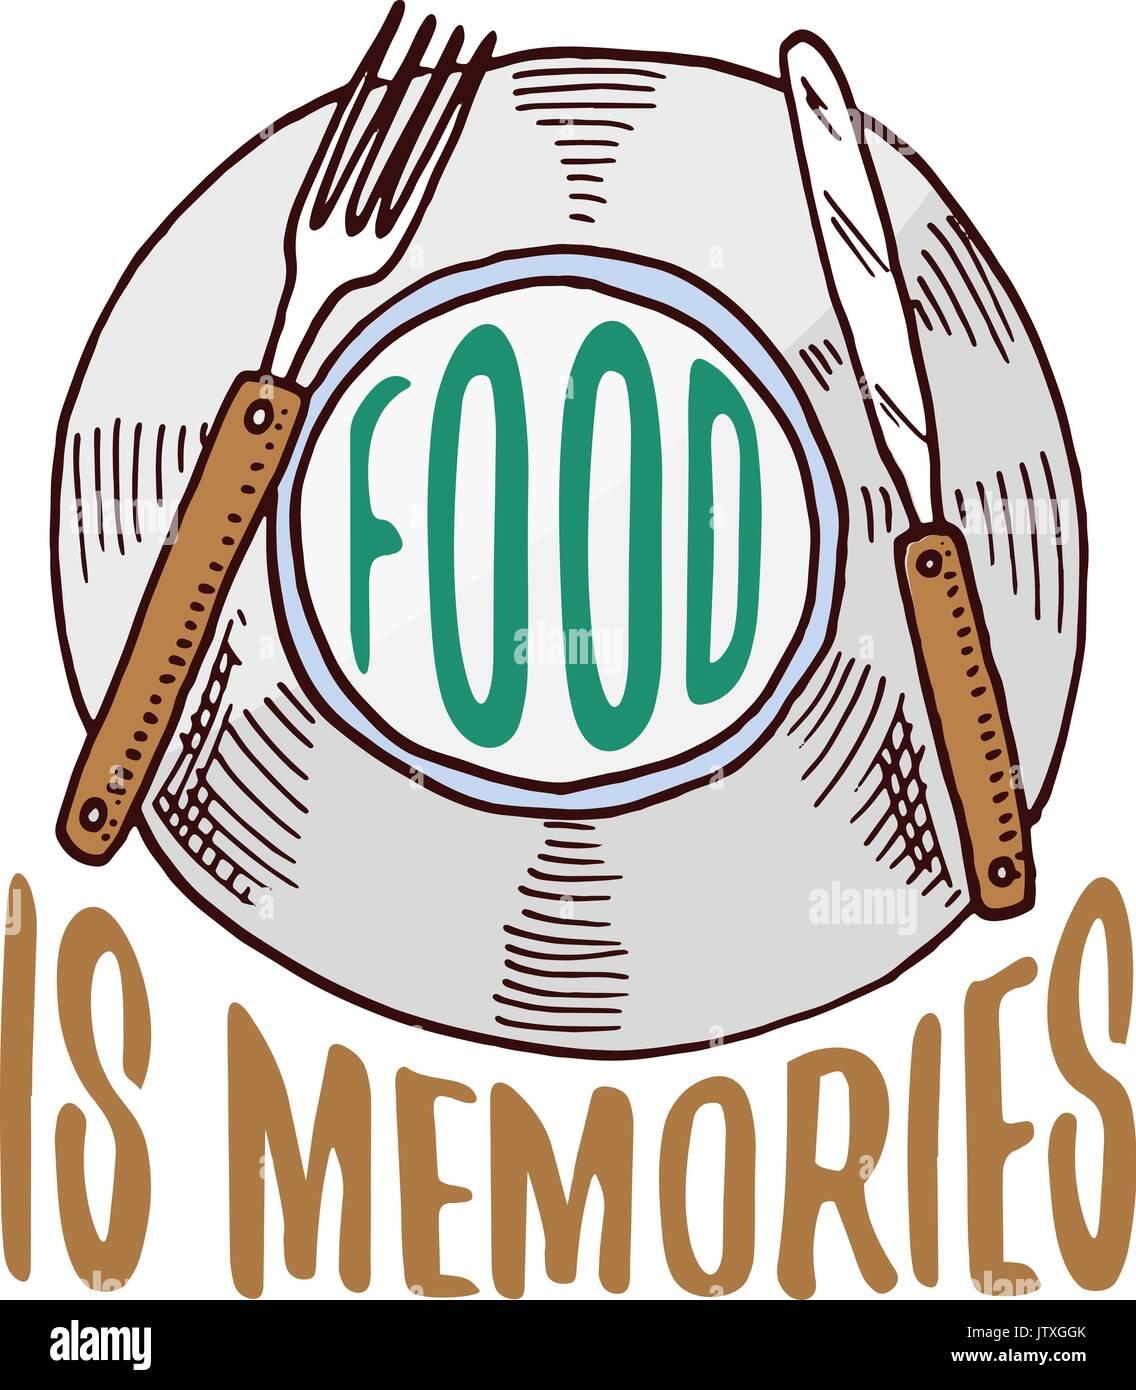 Piastra o utensili da cucina cucina roba per decorazione for Cucina logo